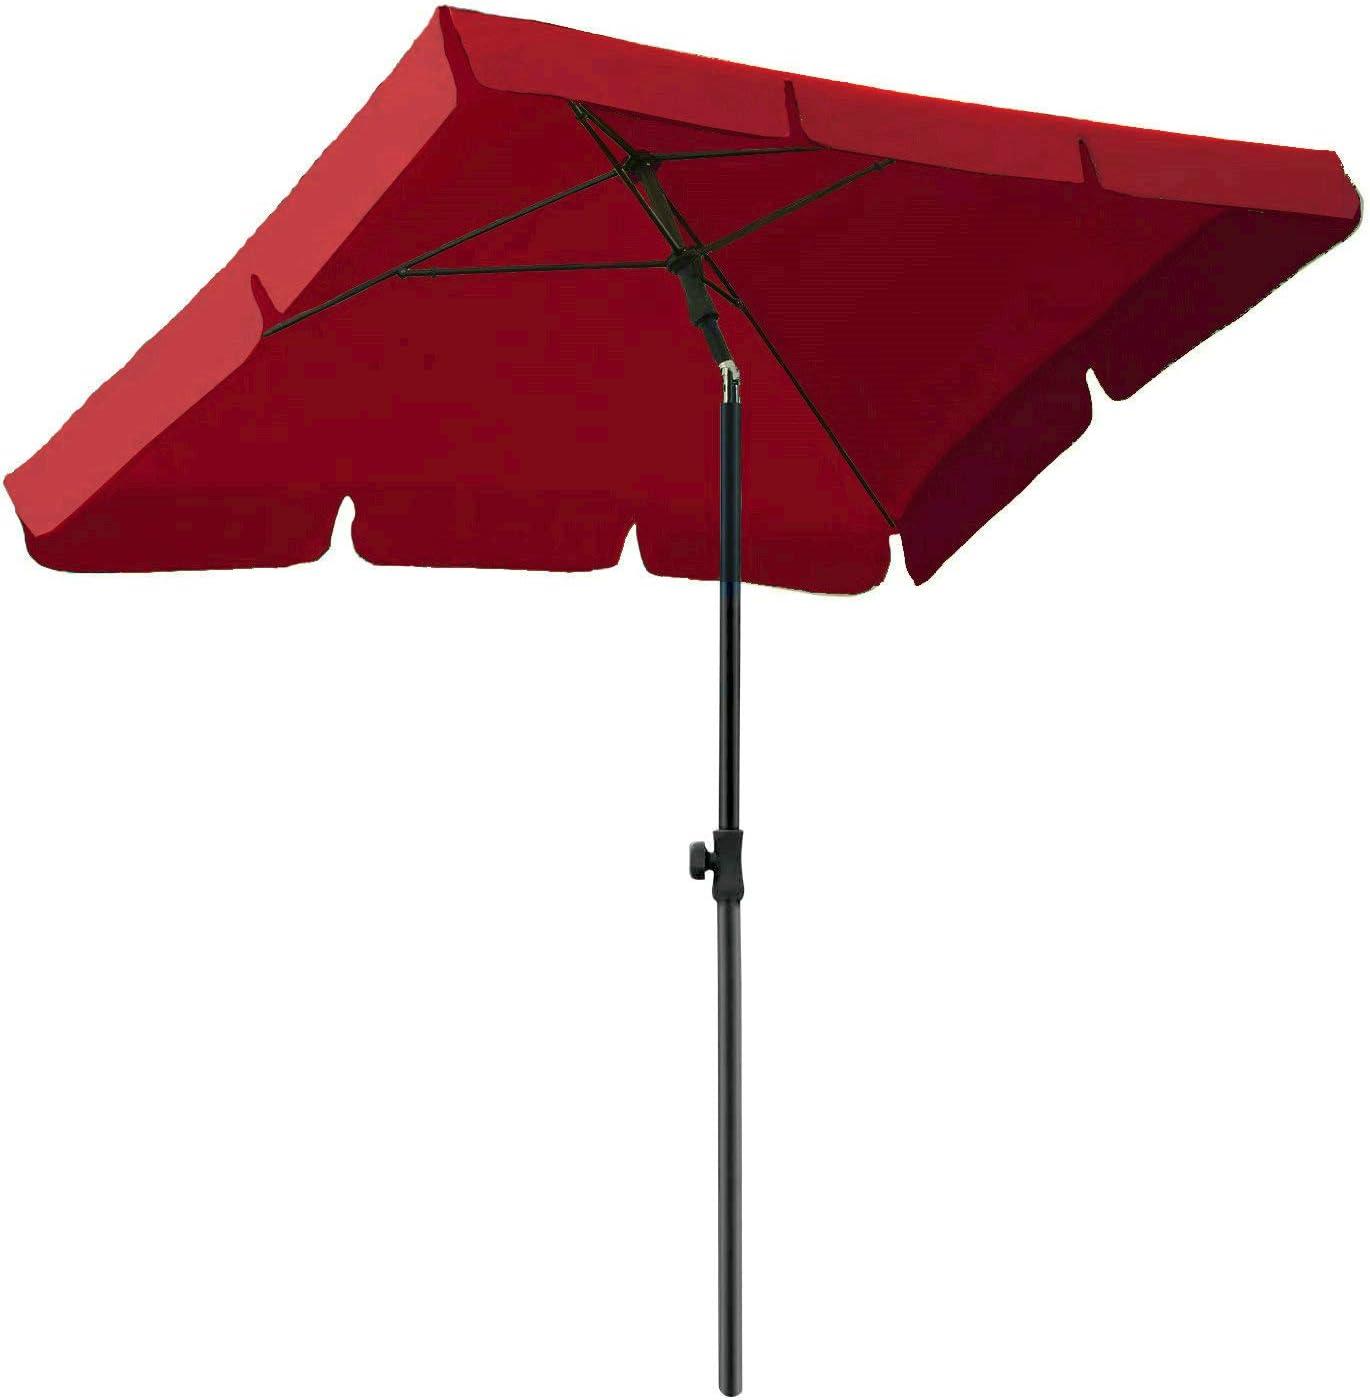 AMMSUN 7ft ふるさと割 流行のアイテム × 4.6ft Rectangular Outdoor Market Umbrella Patio Tab